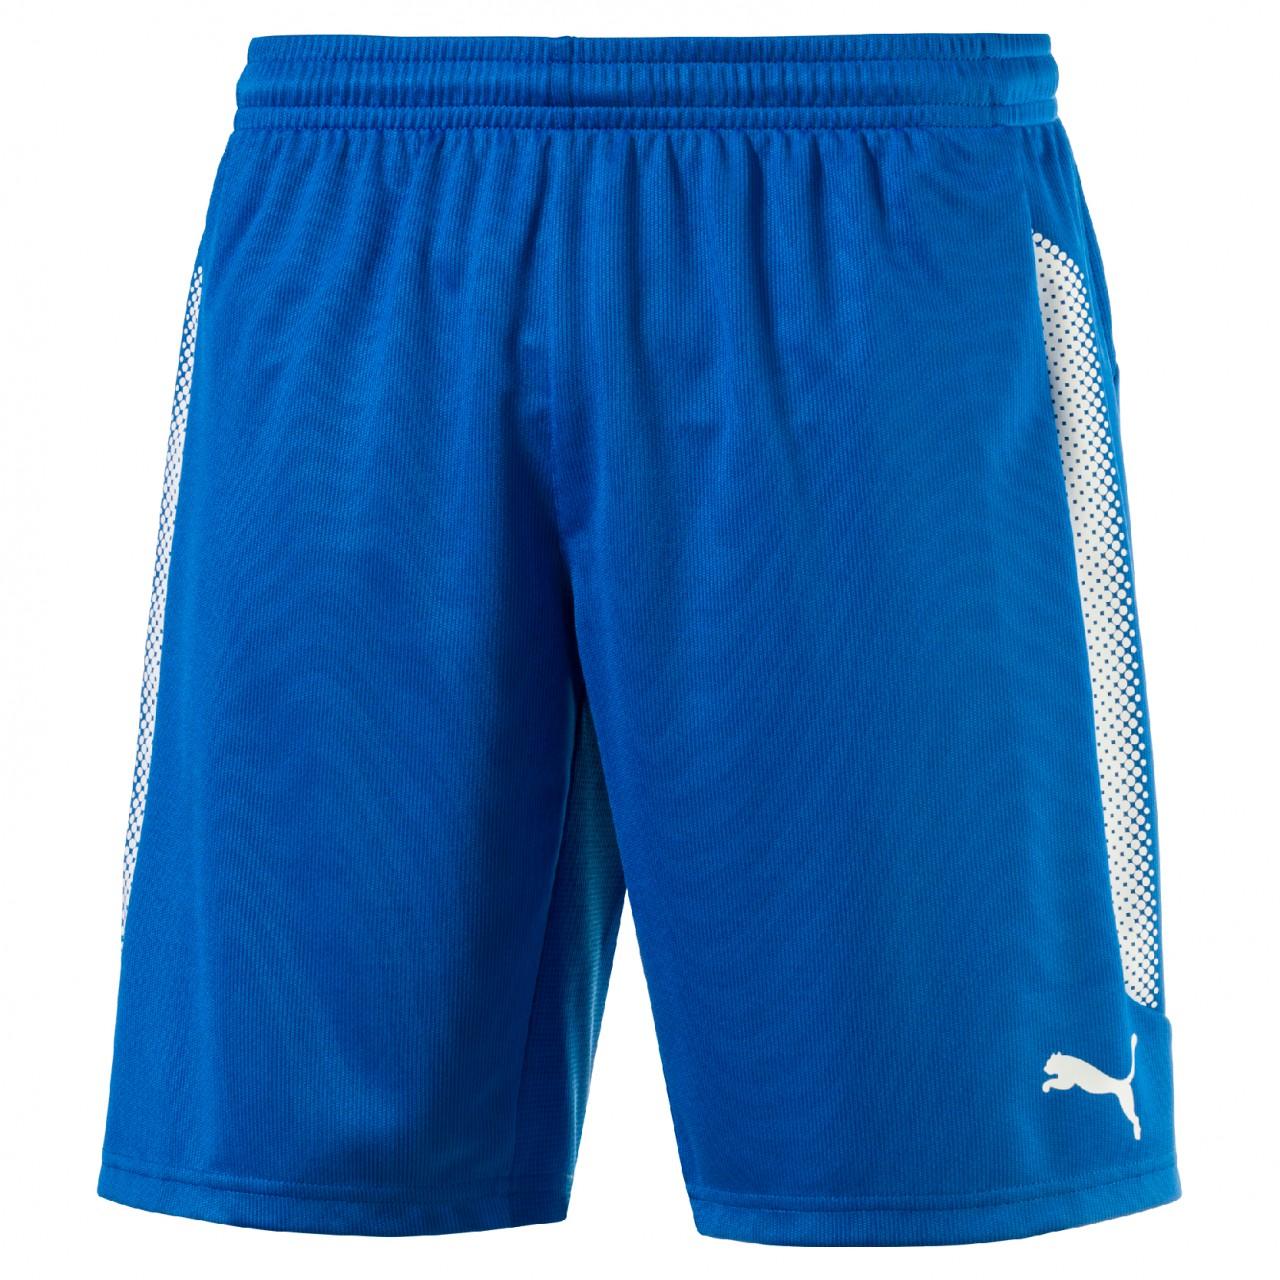 PUMA Striker Shorts with innerbr